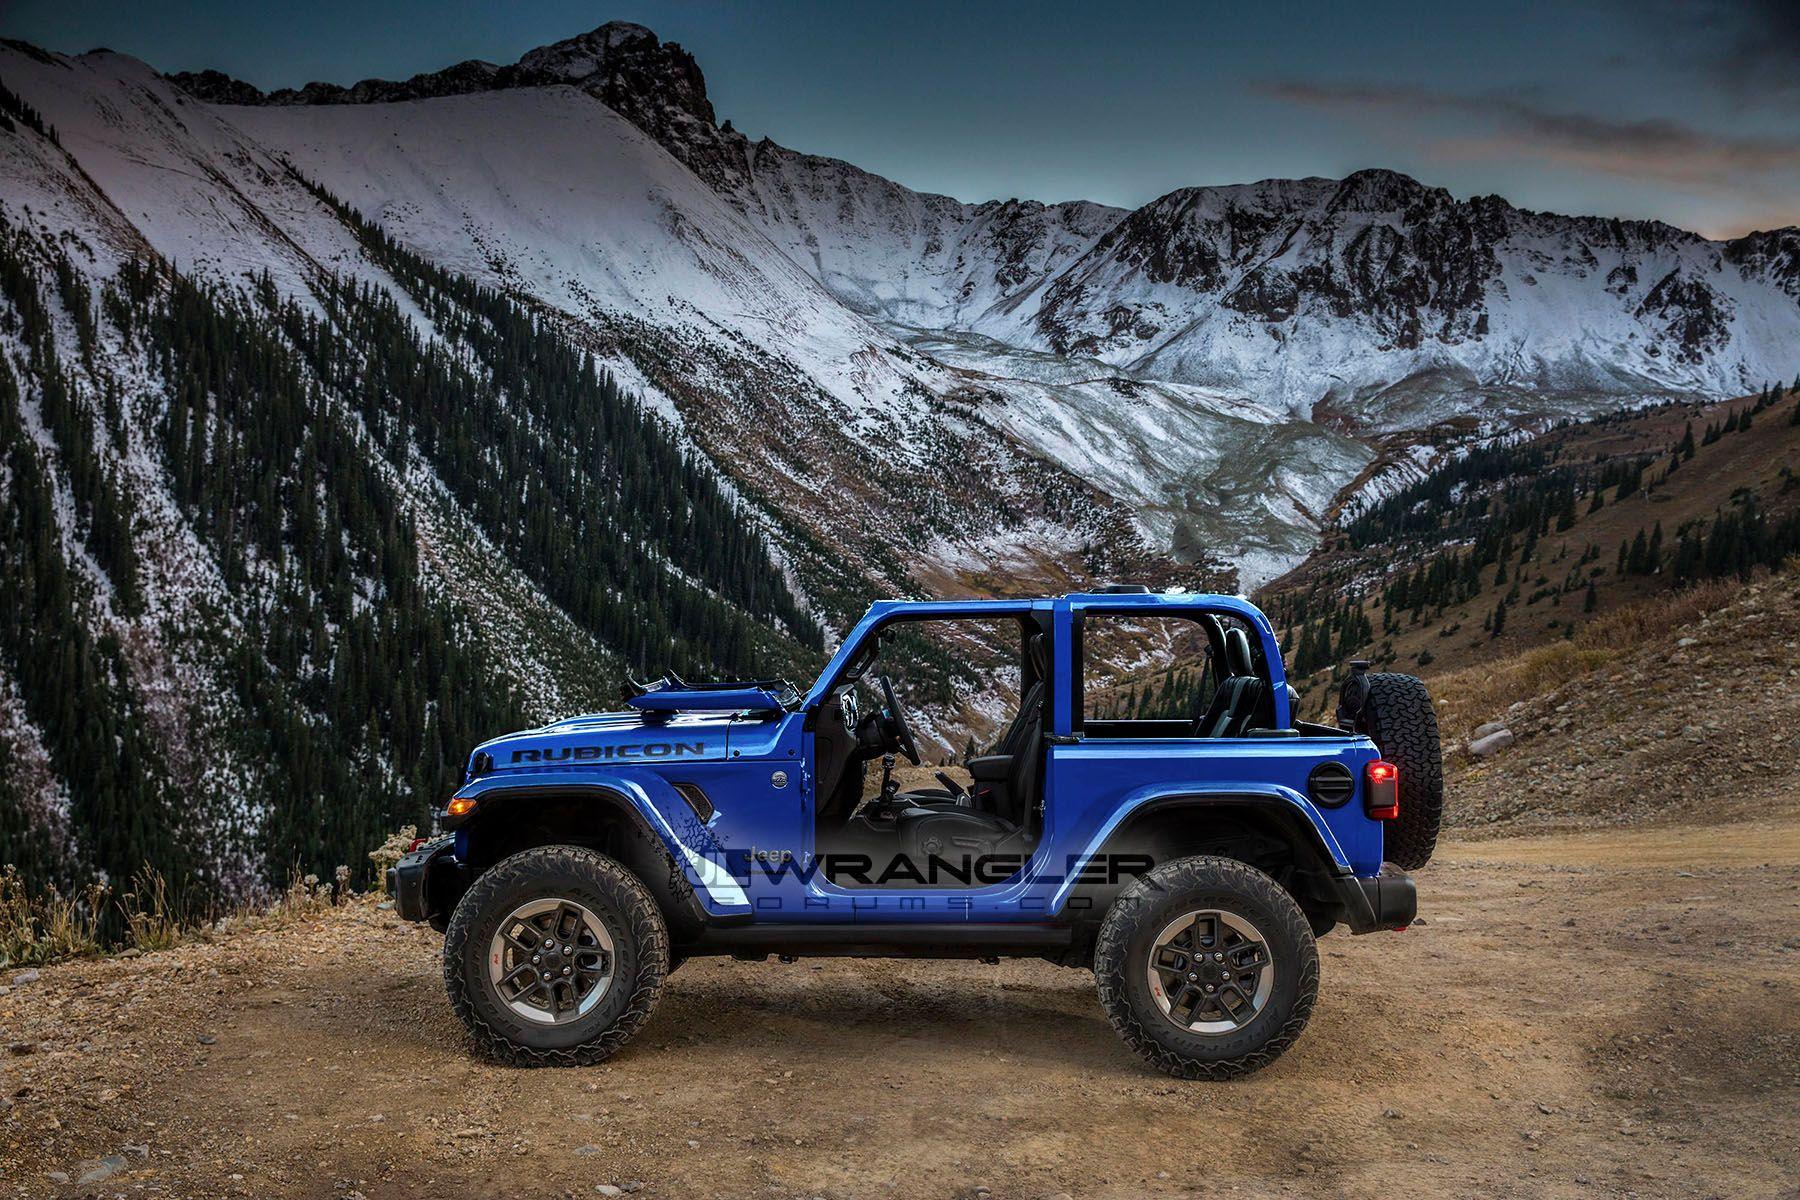 2018 Jeep Wrangler Jl Rubicon Ocean Blue Metallic Clear Coat By Jlwf Jpg Blue Jeep Jeep Wrangler Colors Wrangler Jl